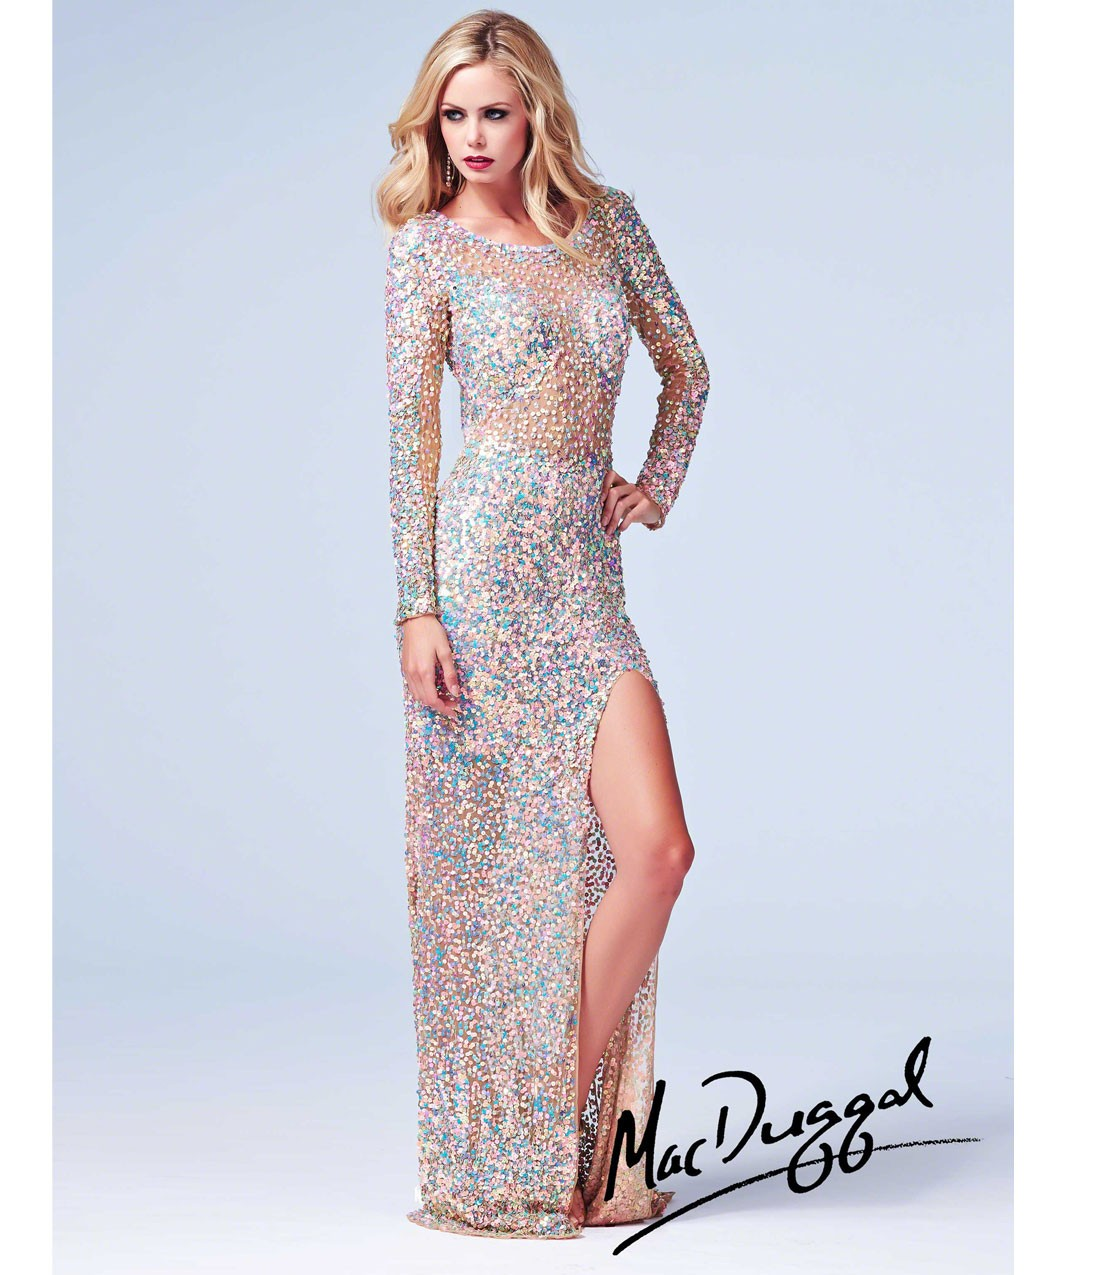 Duggal 2014 Prom Dresses - Nude Metallic Sequin Beaded Long Sleeve ...